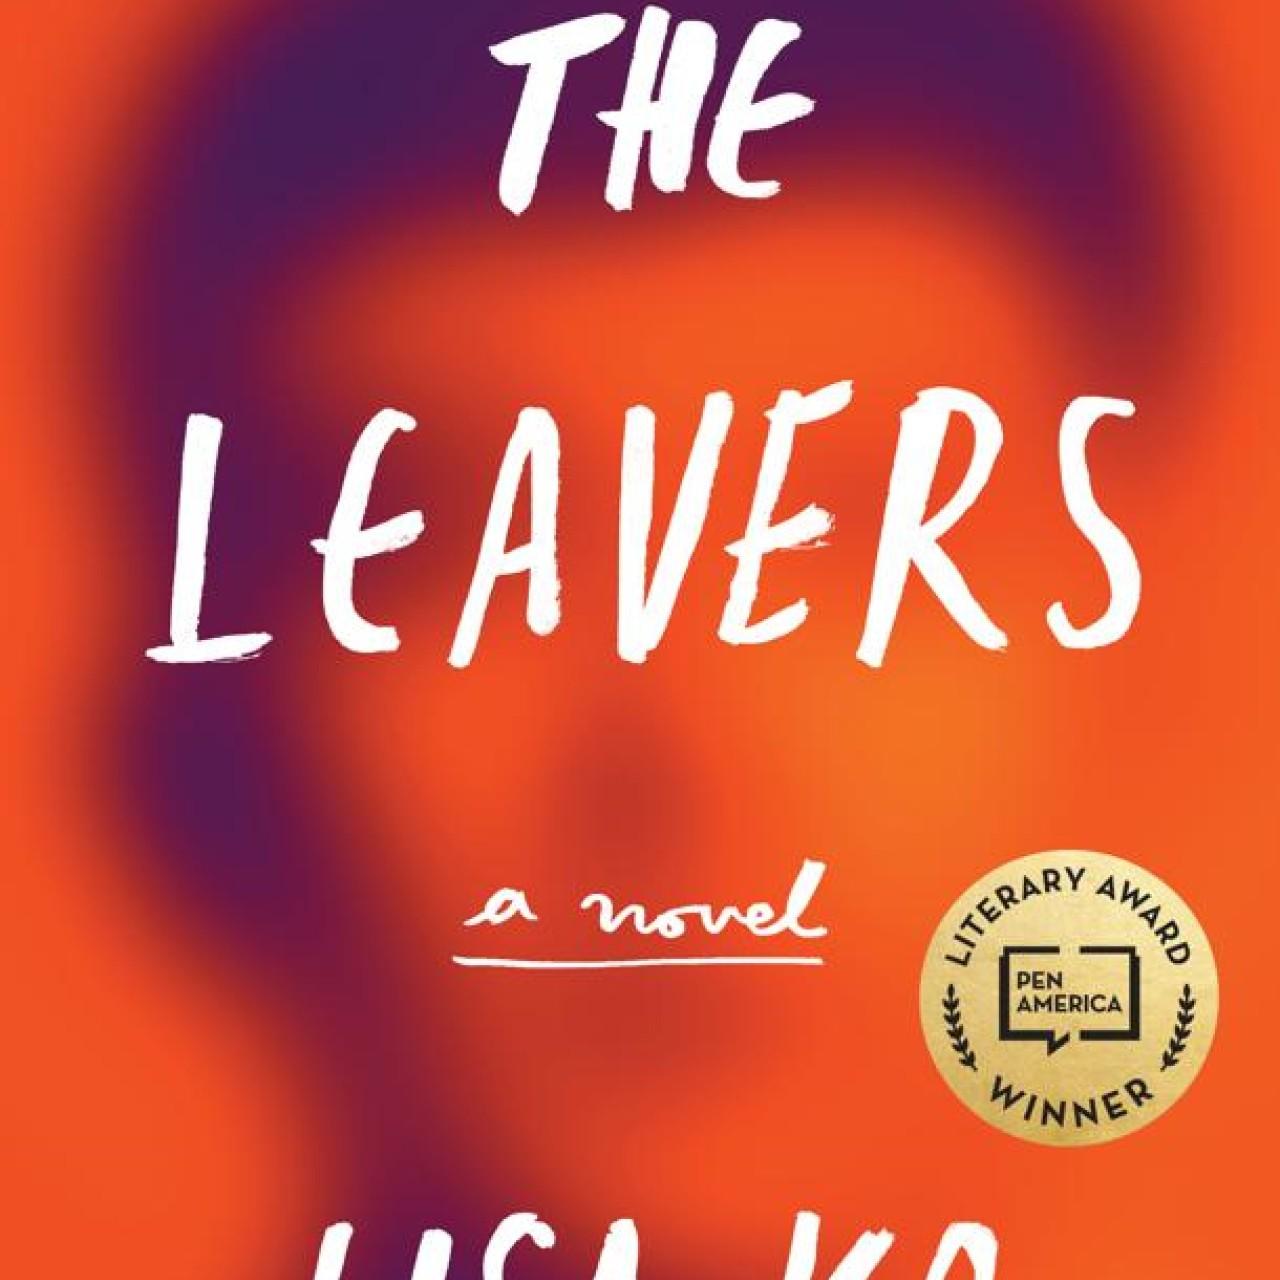 Lisa Ko's emotive debut novel The Leavers explores heartbreak and